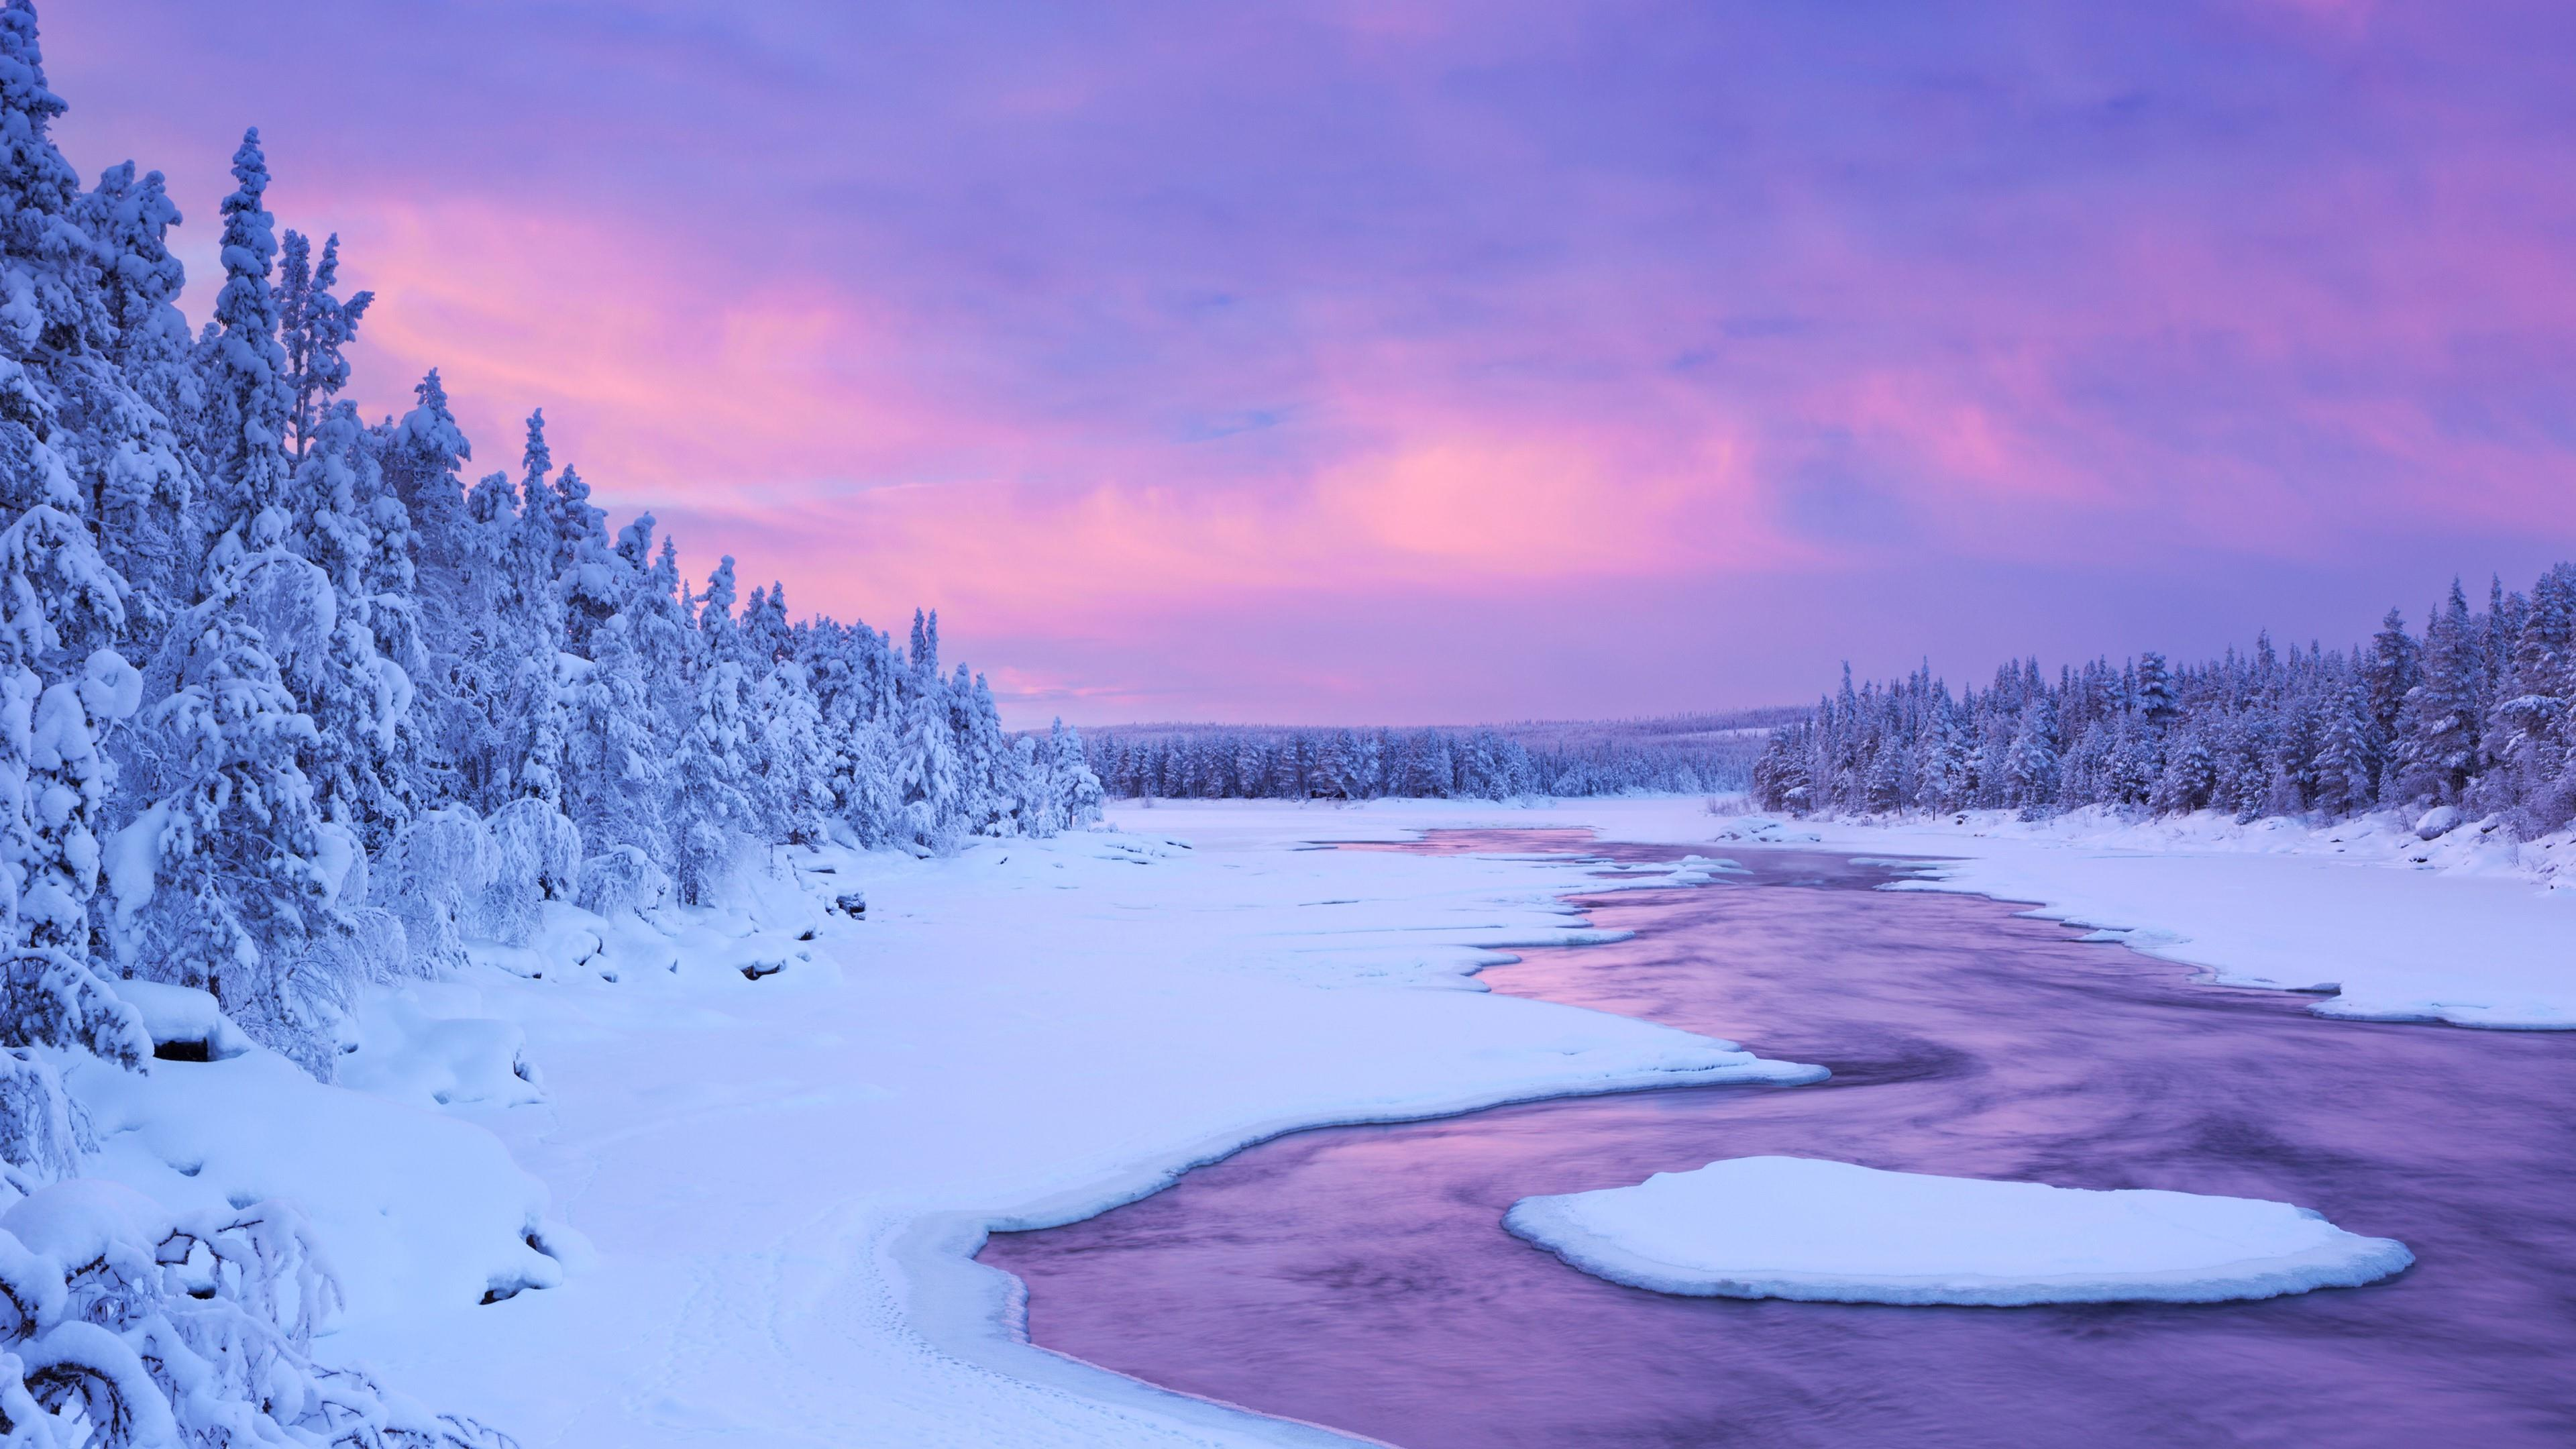 Lapland winter river wallpaper